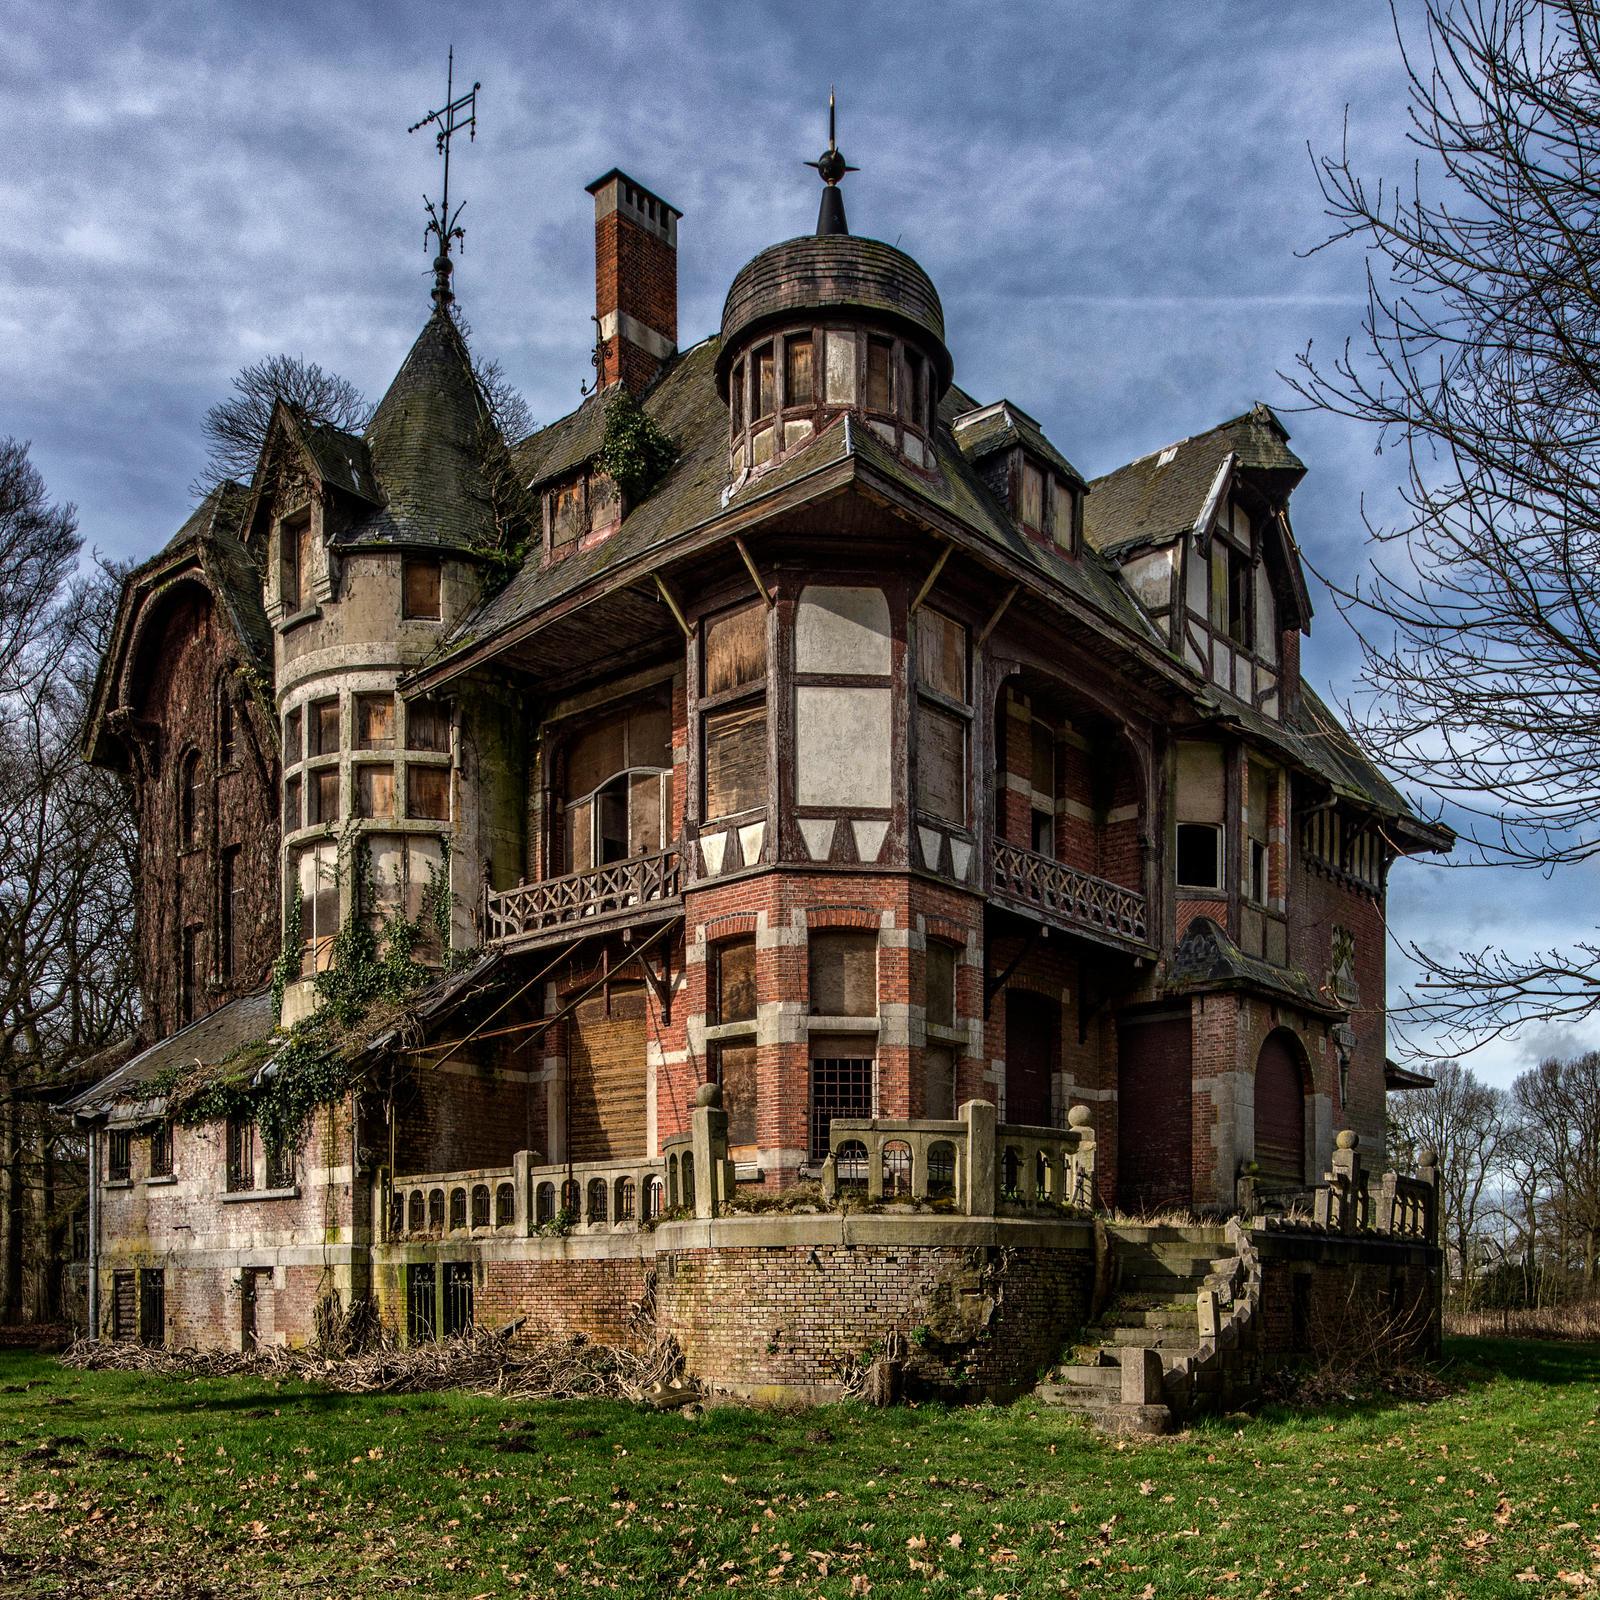 Abandoned Mansion In Belgium. Photo By Bram Zanden [OS